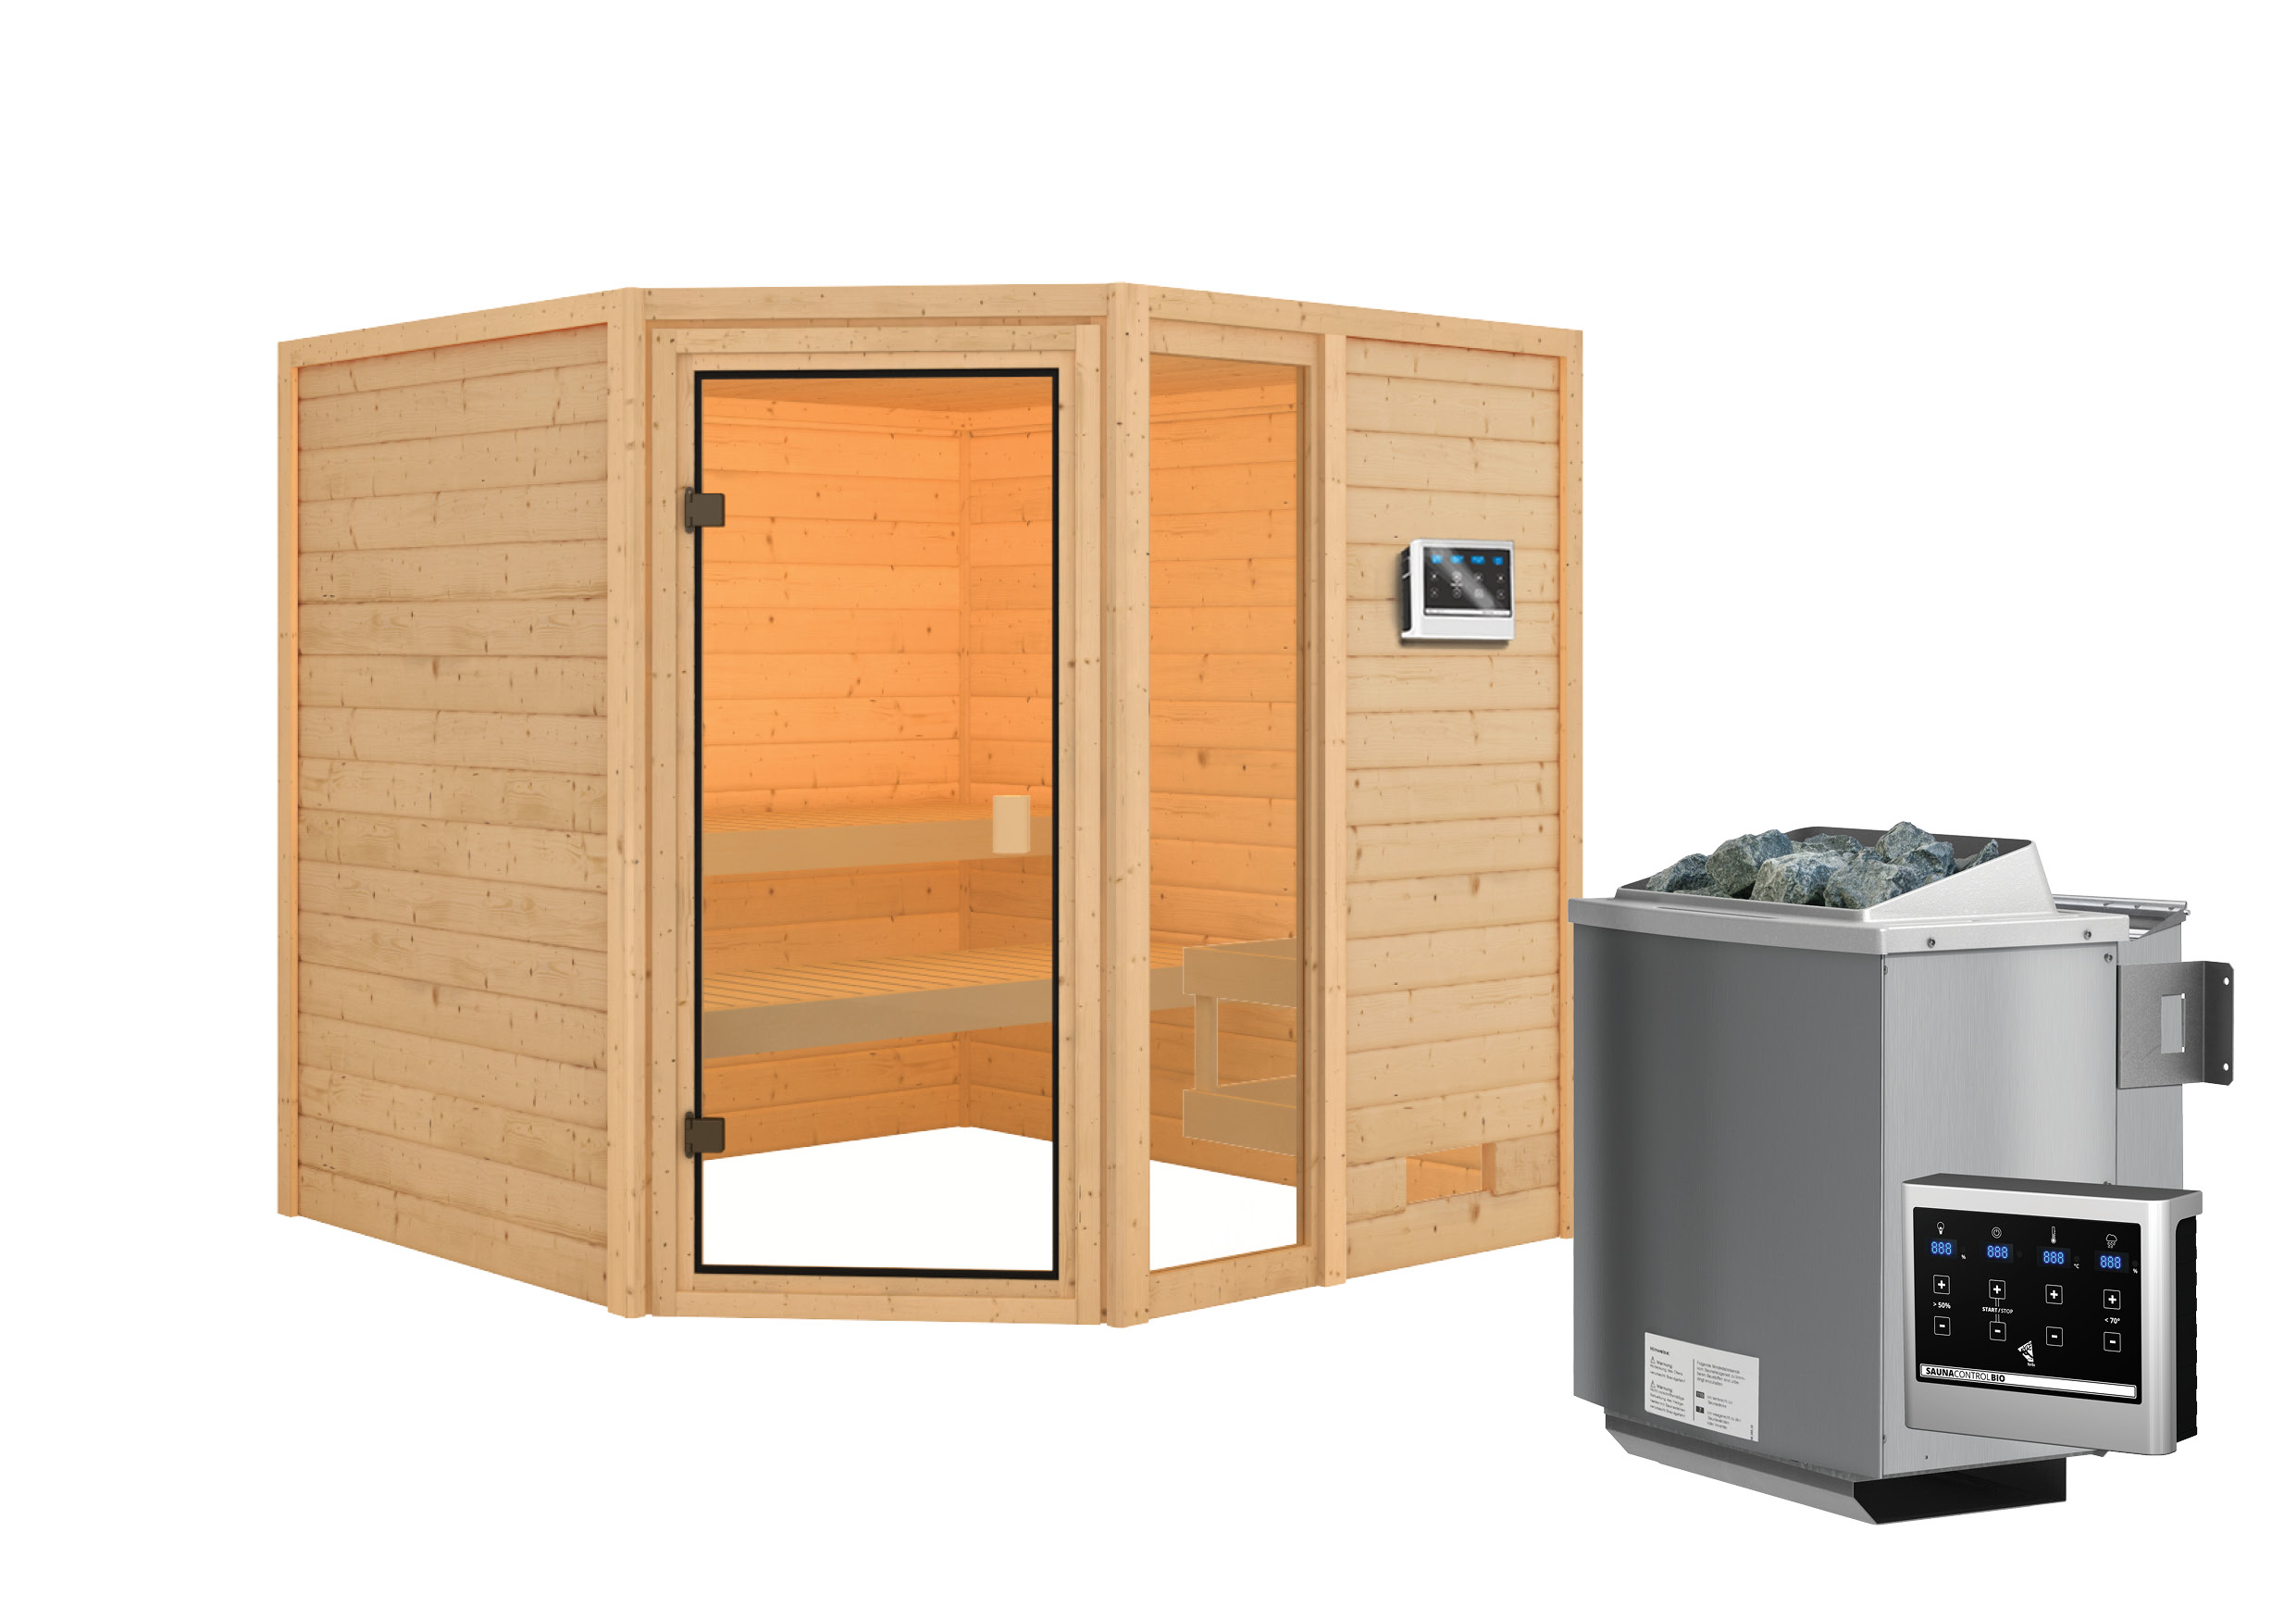 Woodfeeling Sauna Tabea 38mm Bio Saunaofen 9 kW extern Bild 2